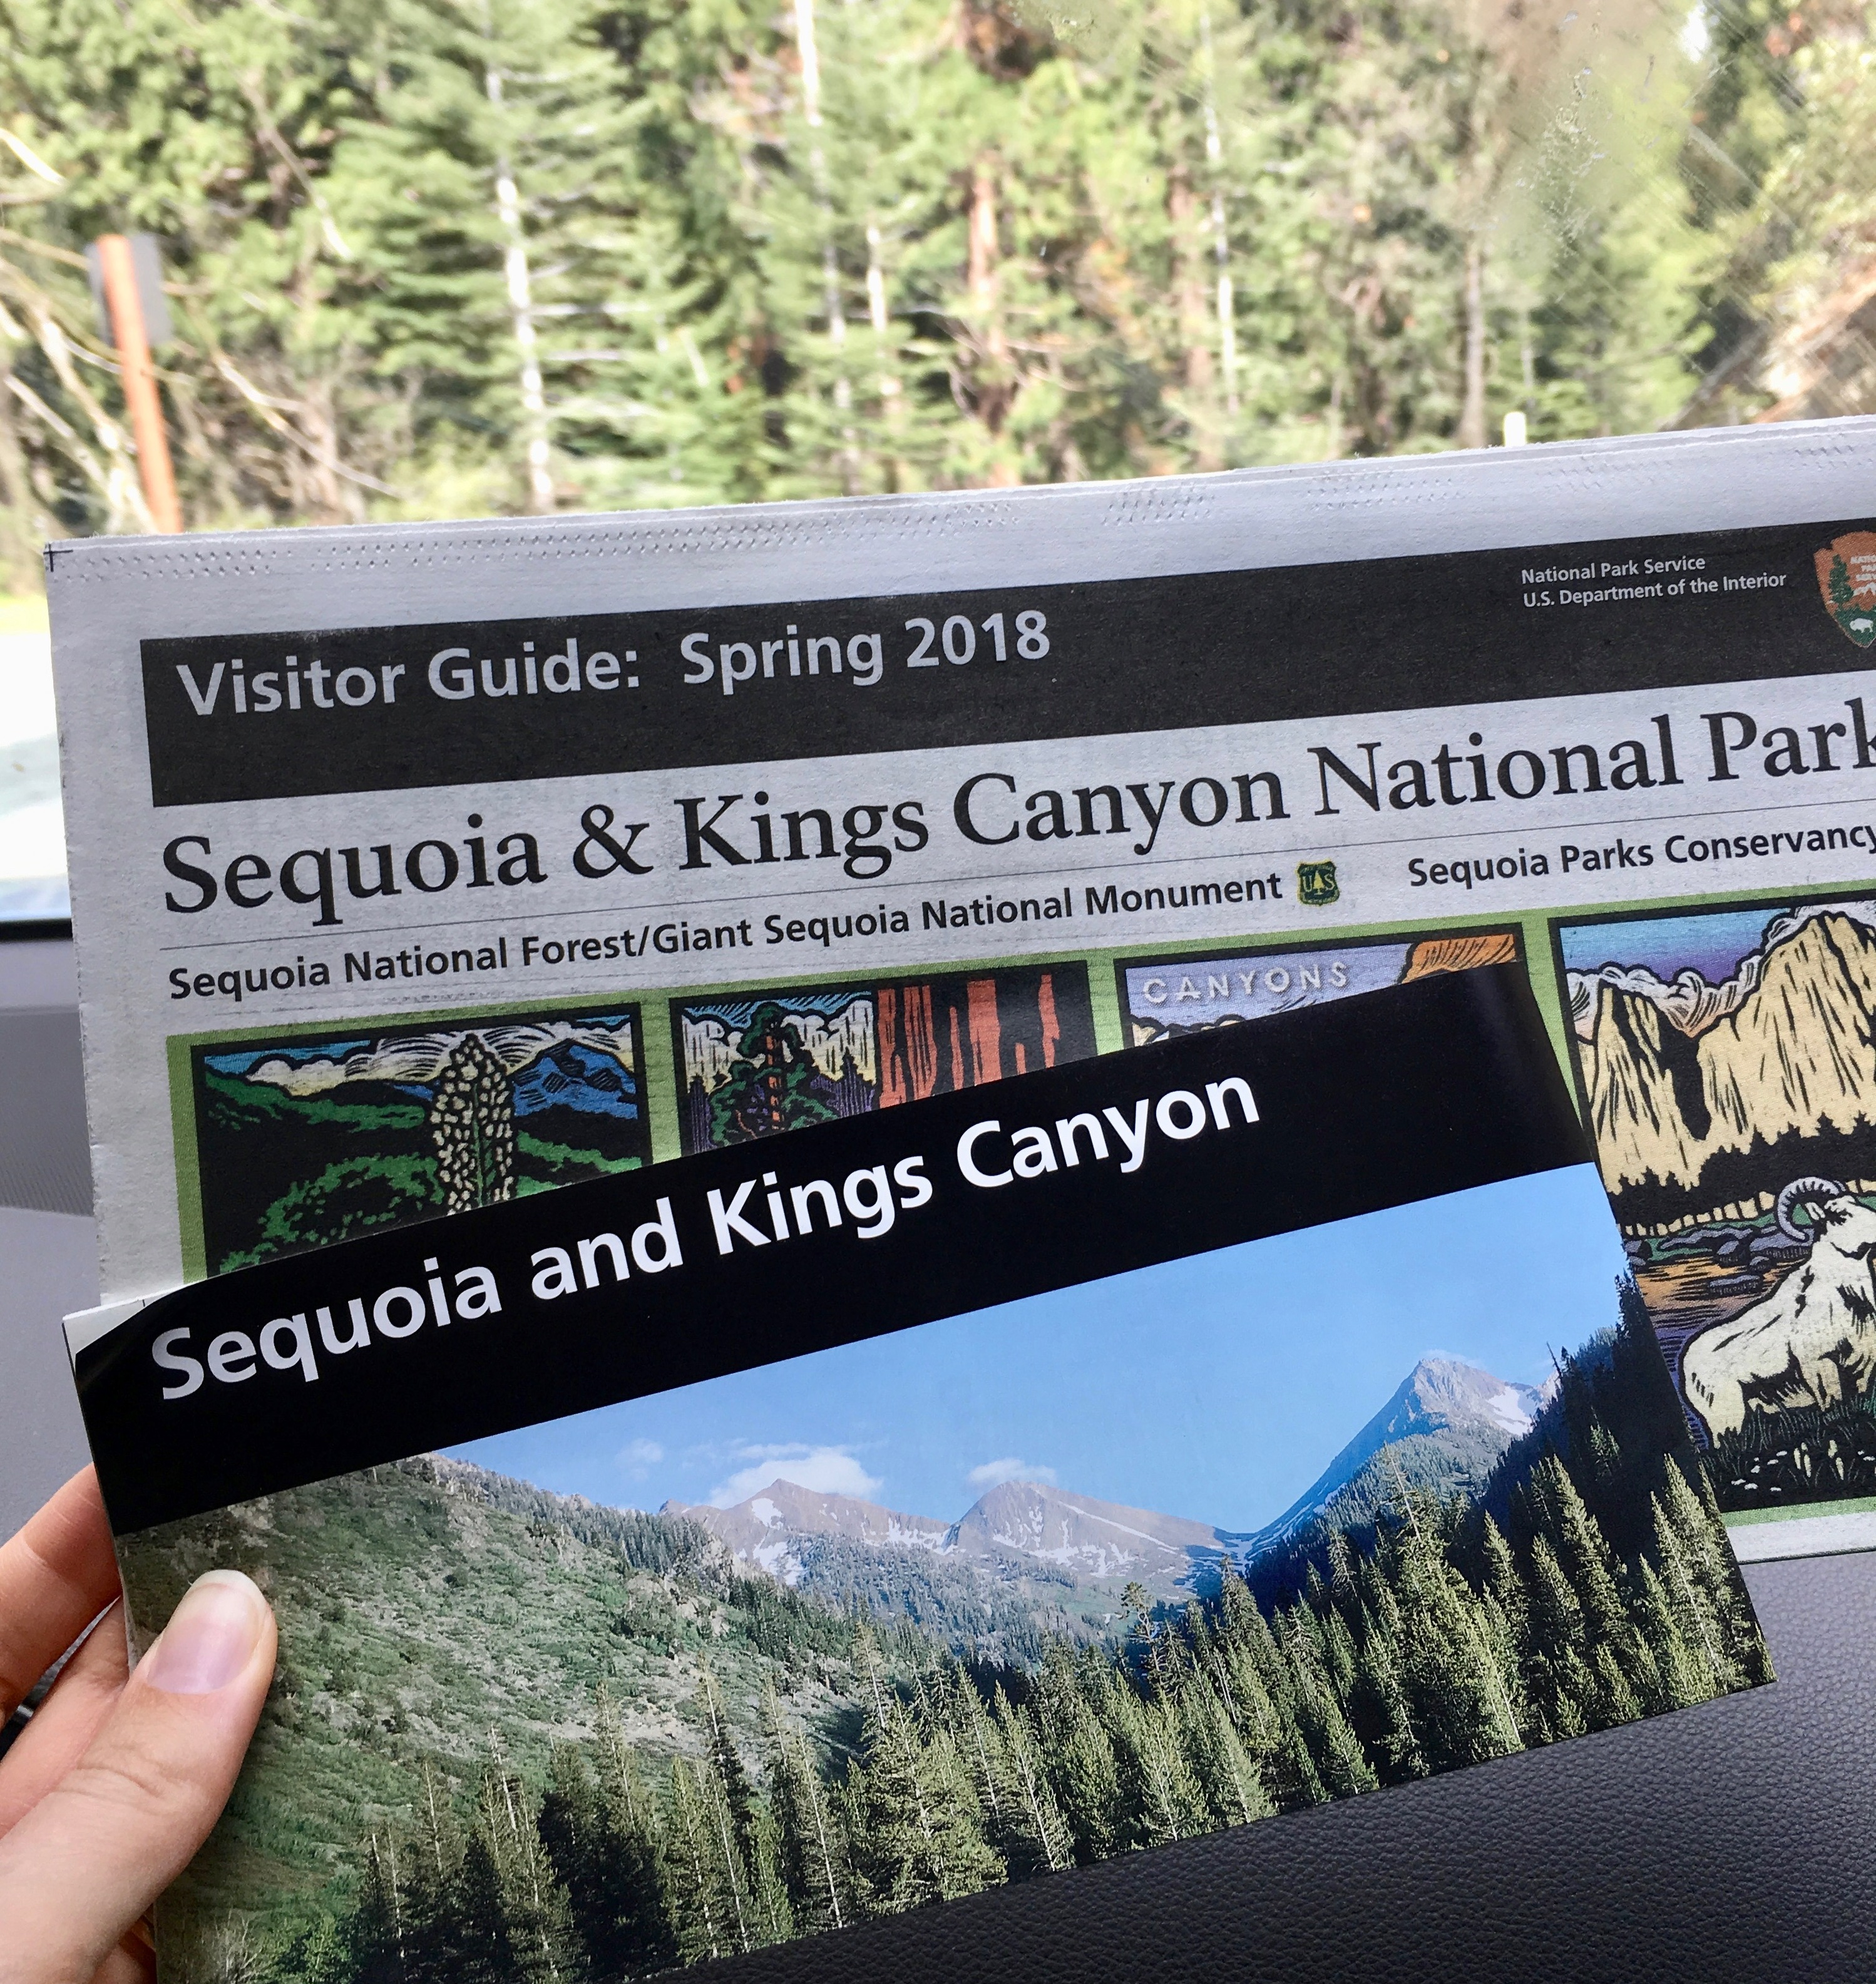 Sequoia National Park!